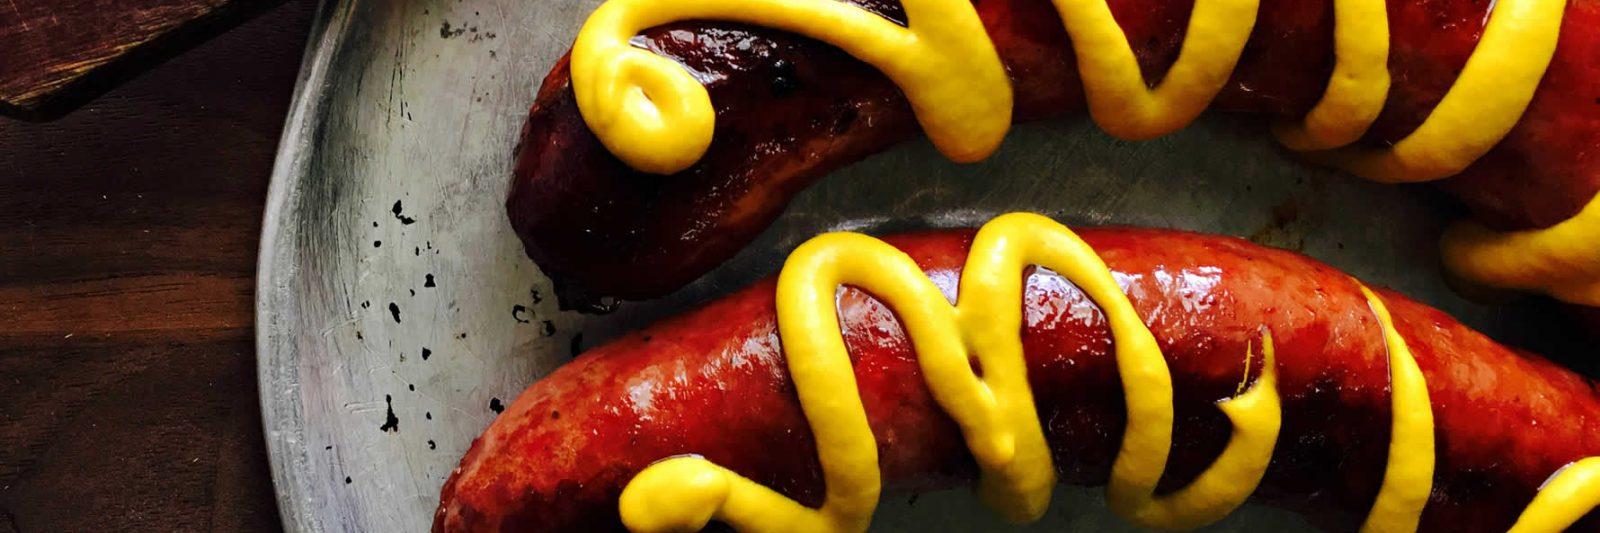 Mustard on sausages